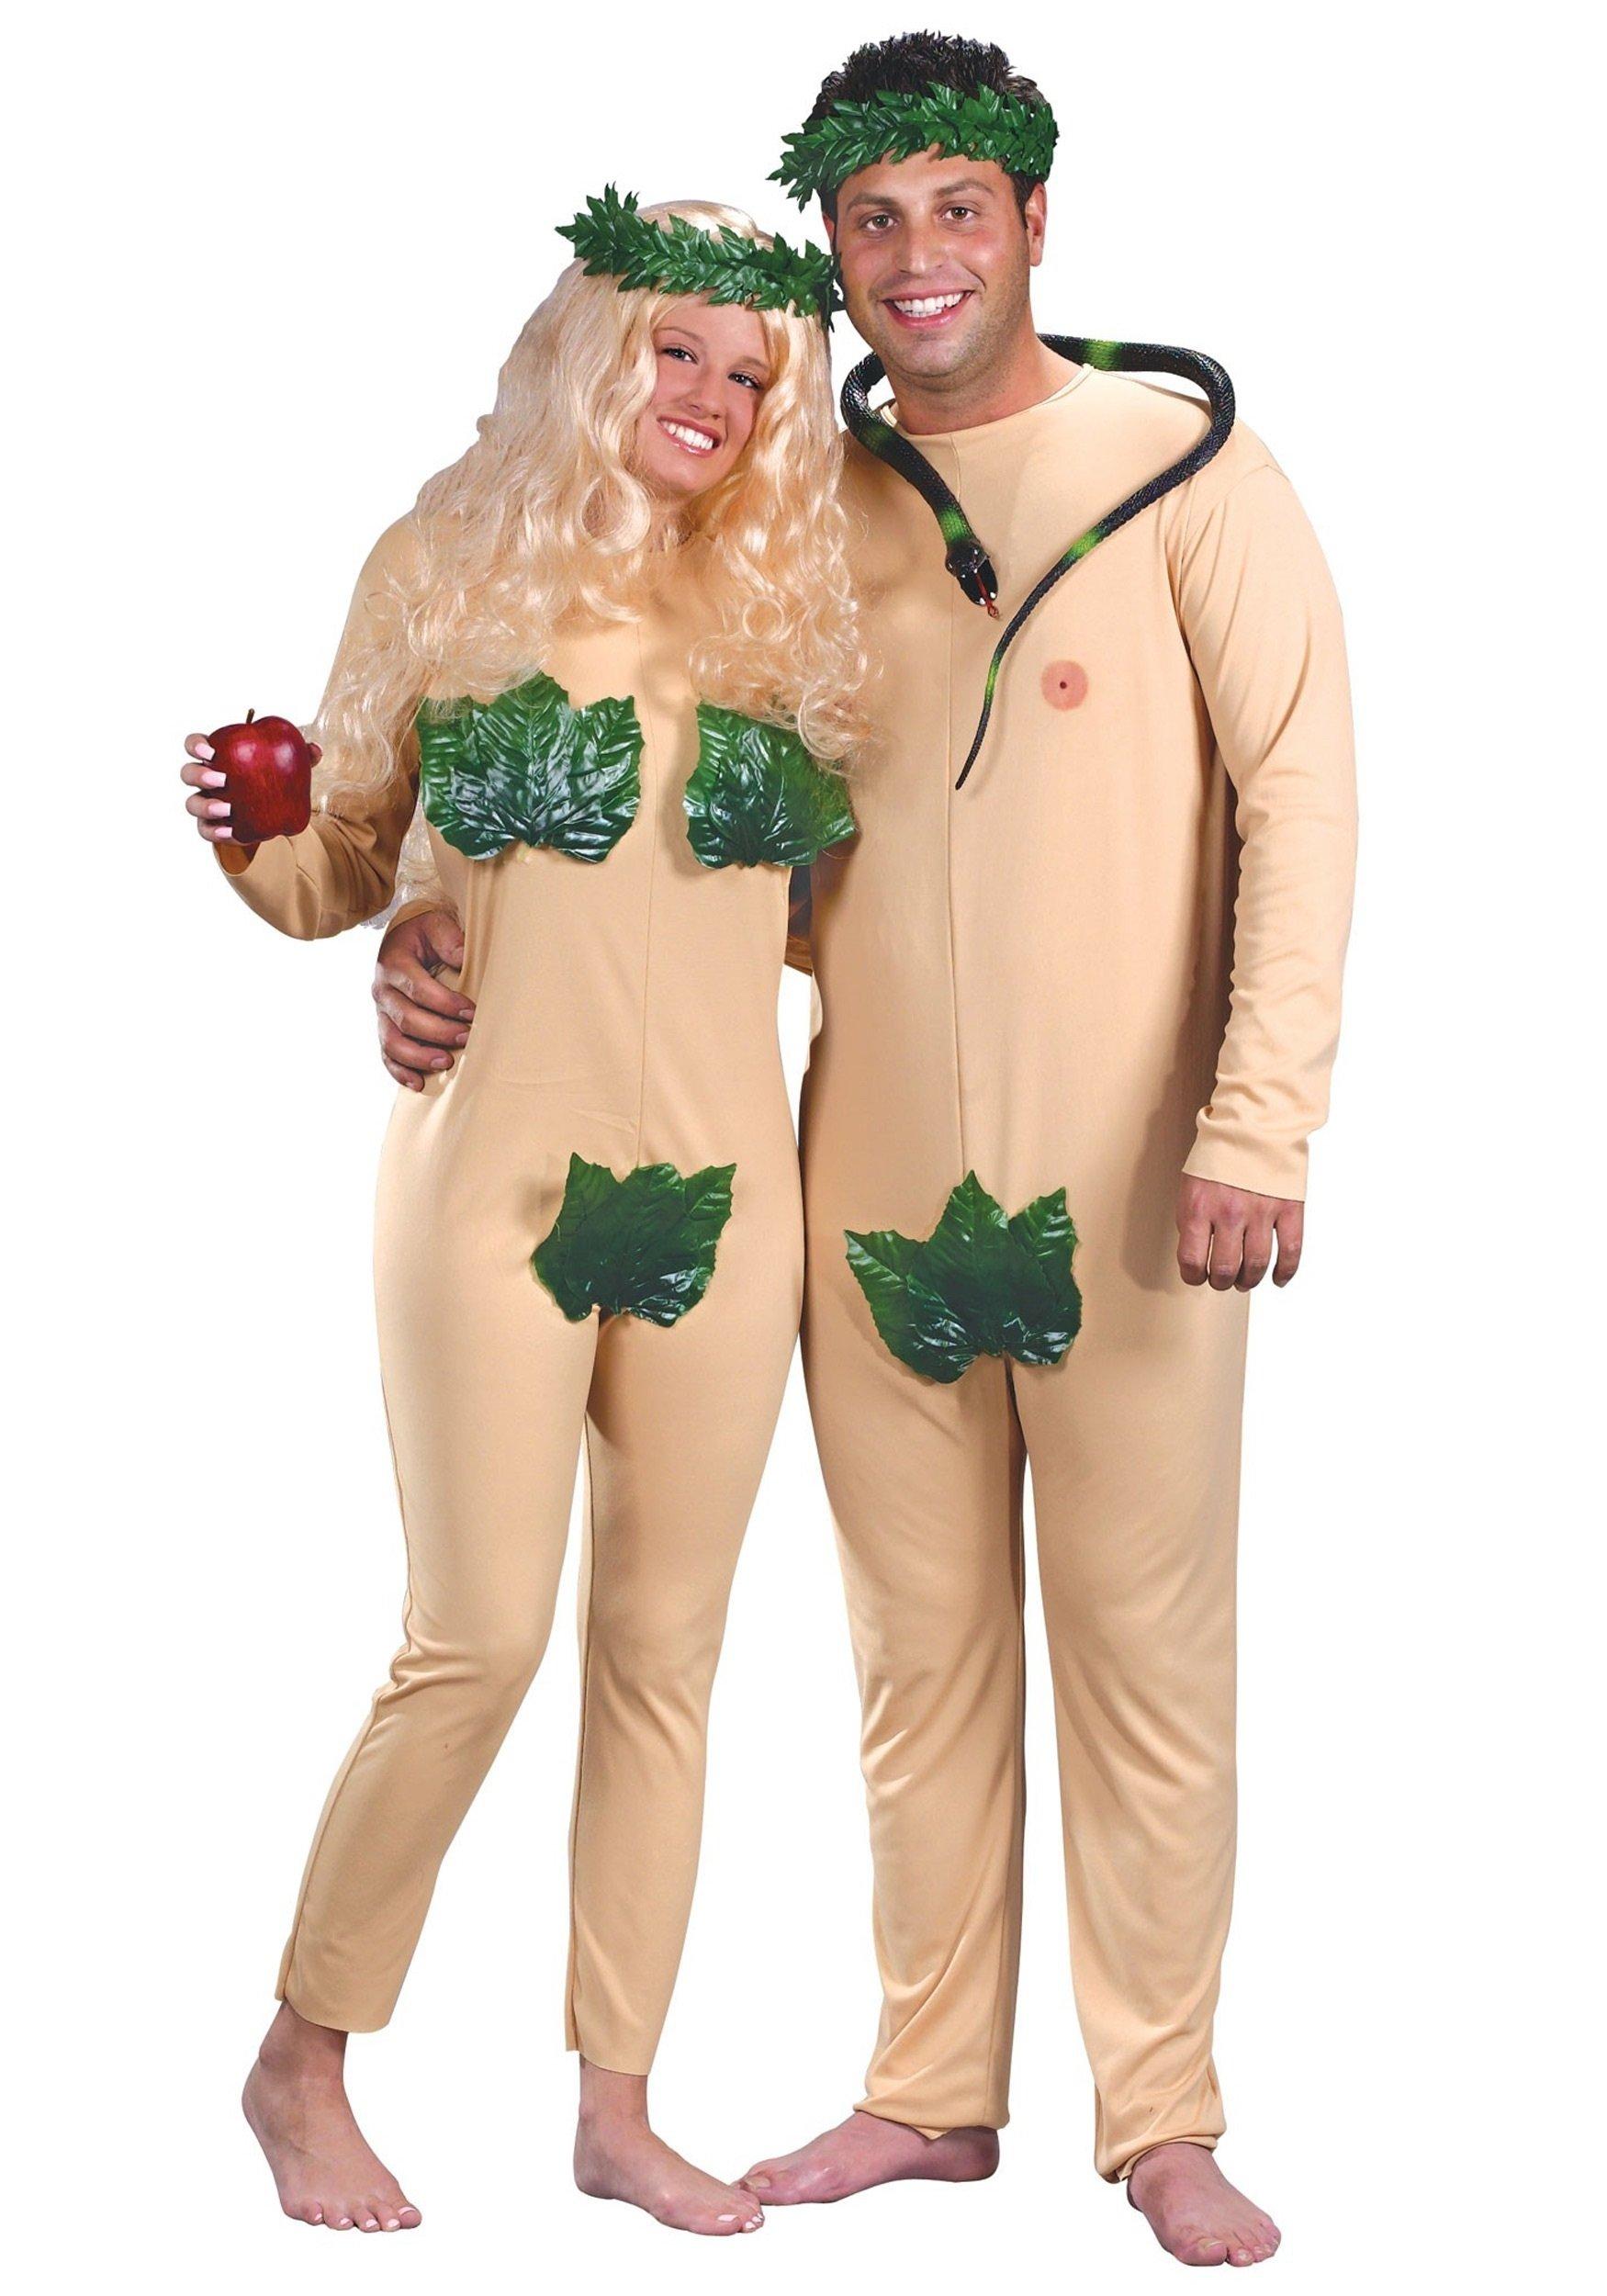 10 Fabulous Adam And Eve Costume Ideas adam and eve costume 2020